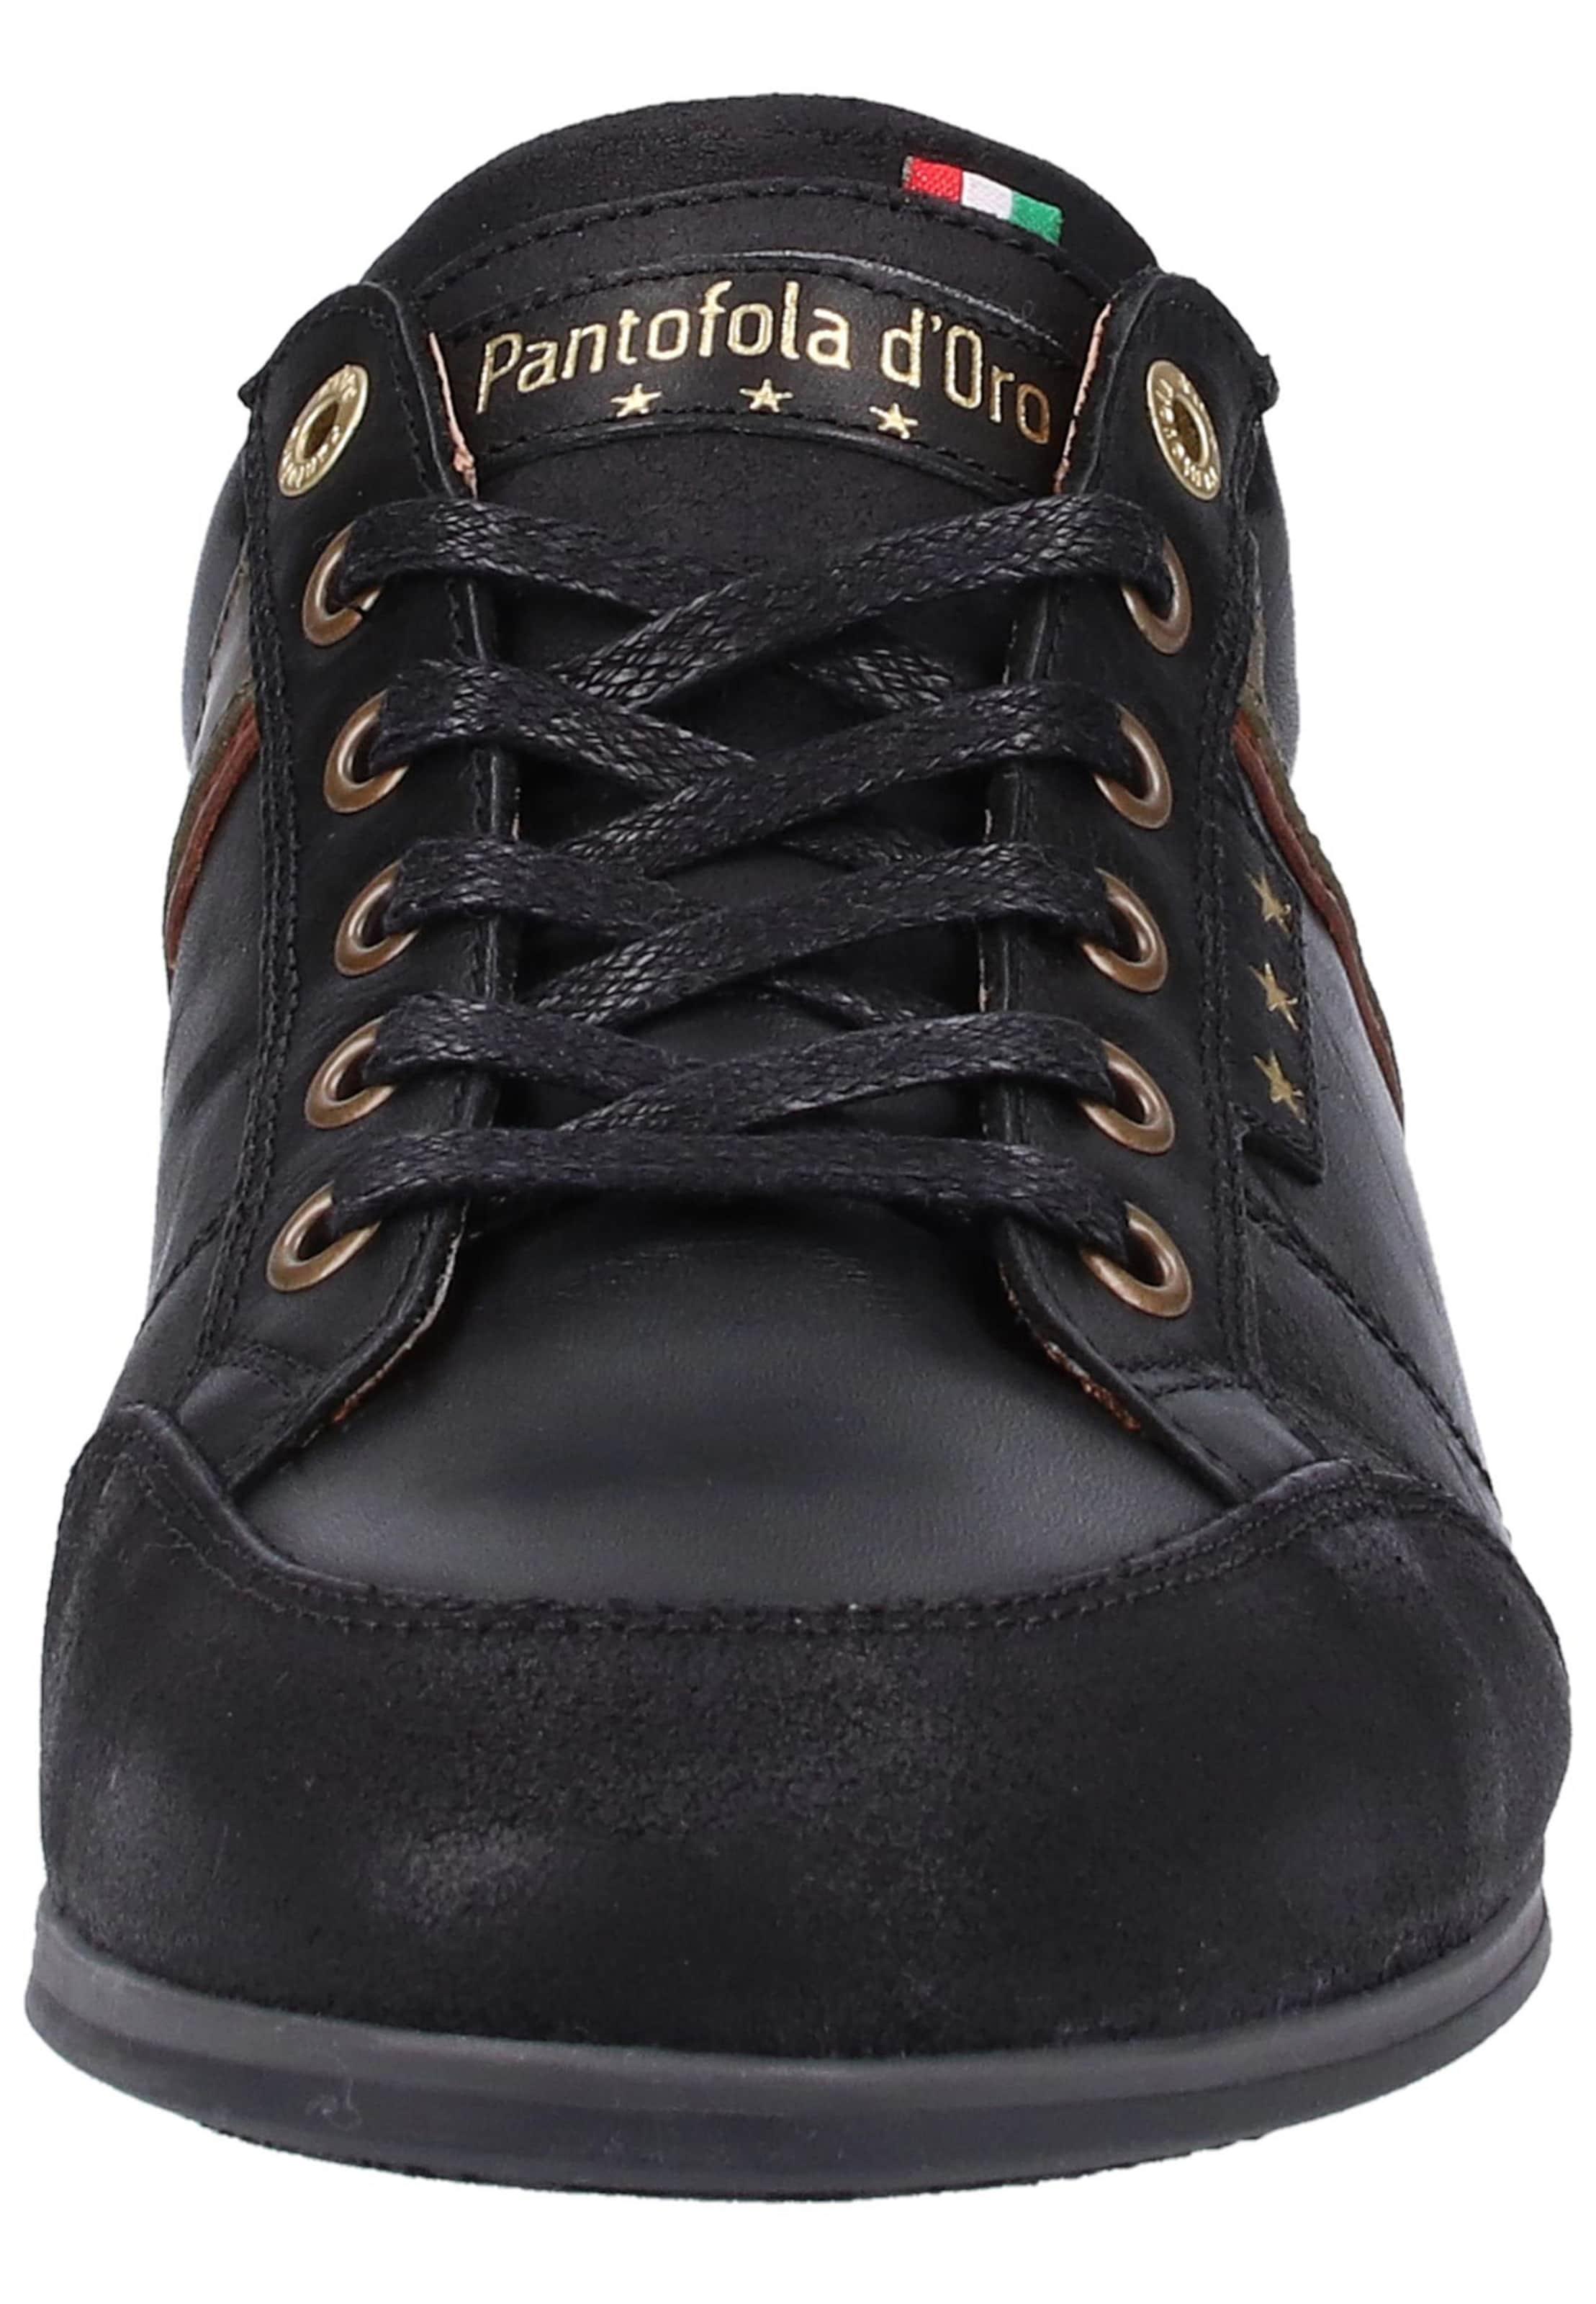 In Pantofola KaramellBrokat Schwarz D'oro Sneaker Kc3J1TlF